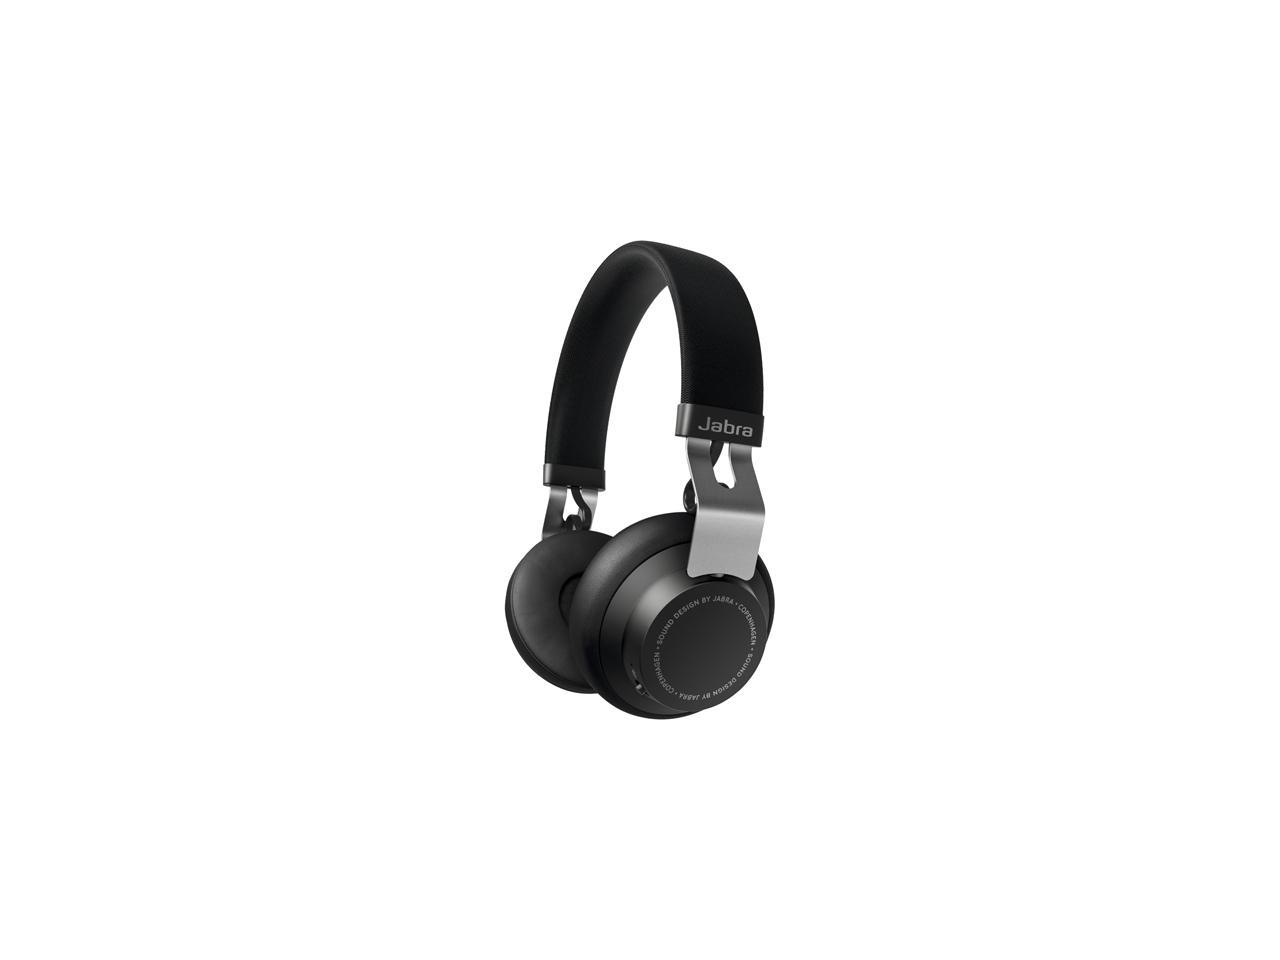 Newegg: Jabra Elite 25h Wireless Bluetooth Music Headphones @ .99 + Free Shipping